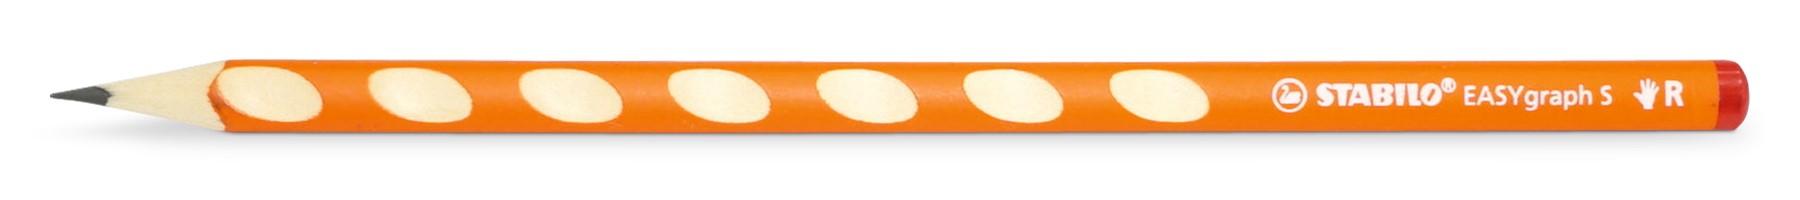 Stabilo Easygraph Bleistift, dünn